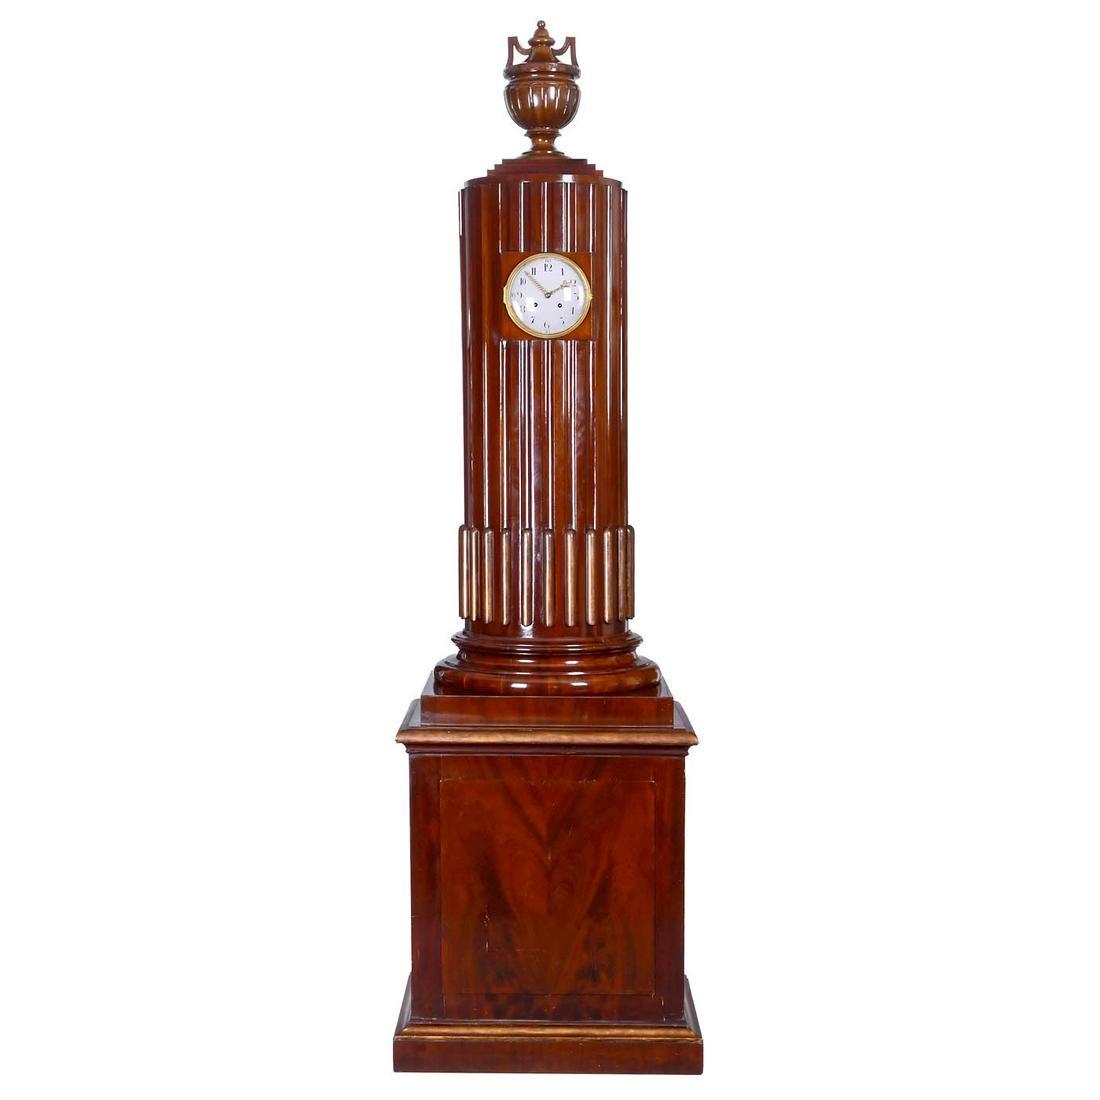 Rare Empire Timepiece with Organ c. 1800